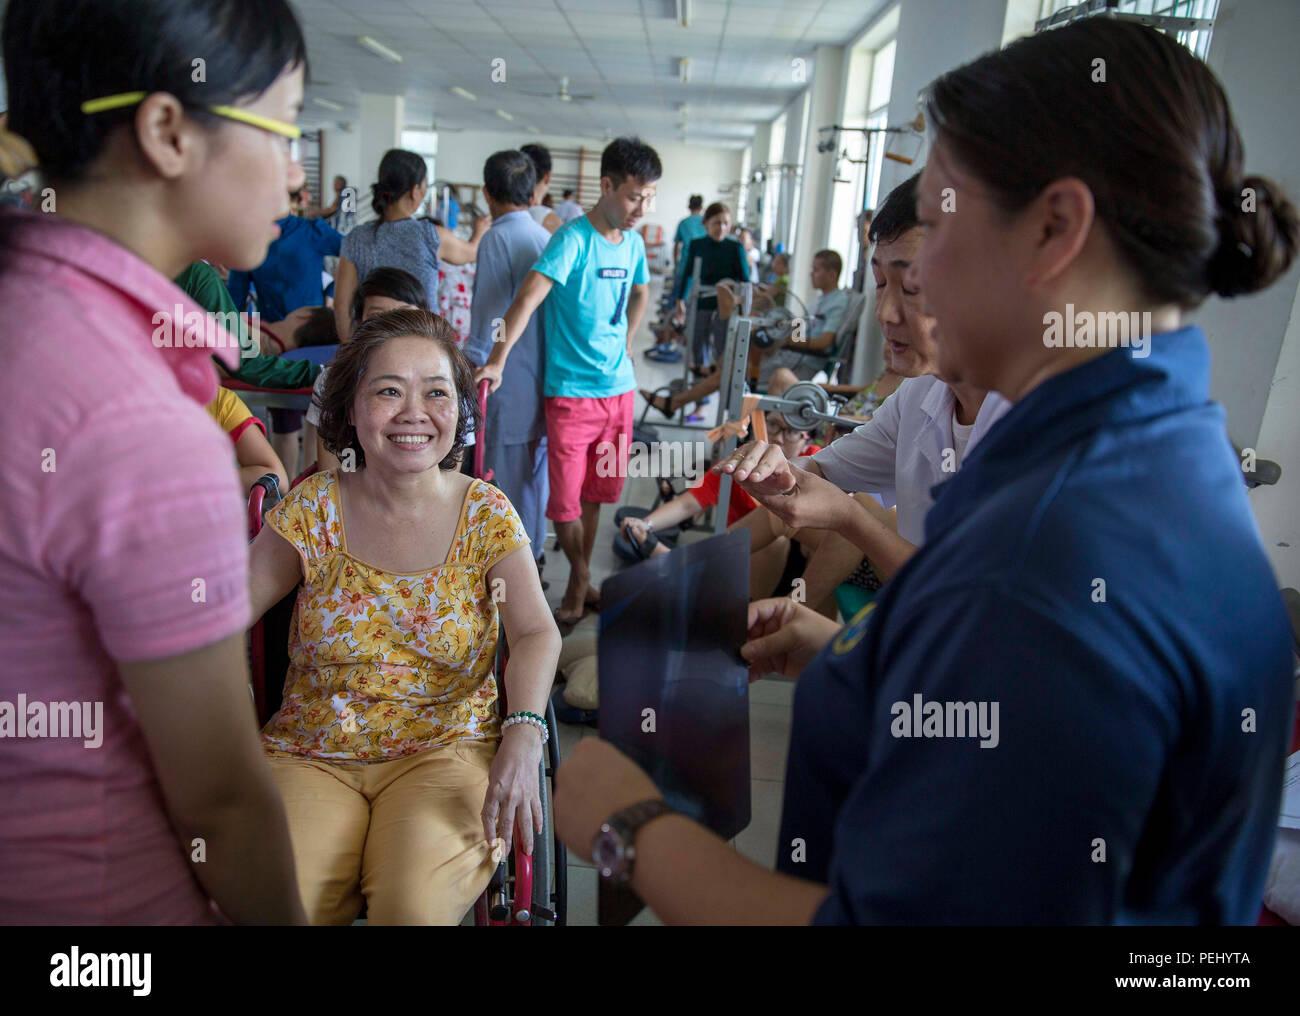 DA NANG, Vietnam (Aug  19, 2015) Lt  Melissa Parks (right), a Navy